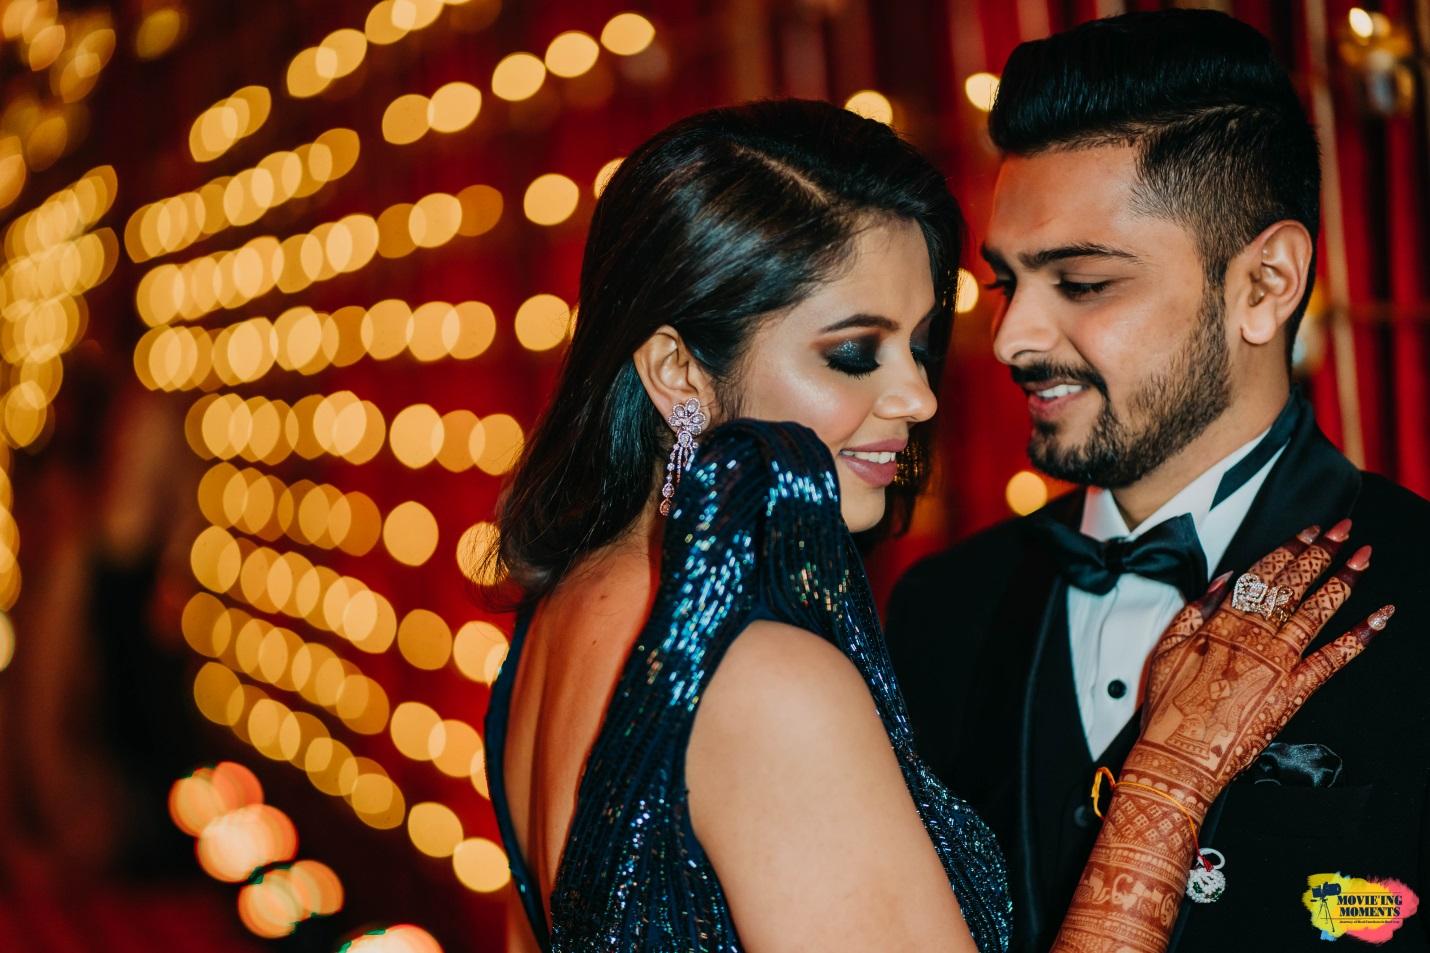 Bride and groom photoshoot ideas